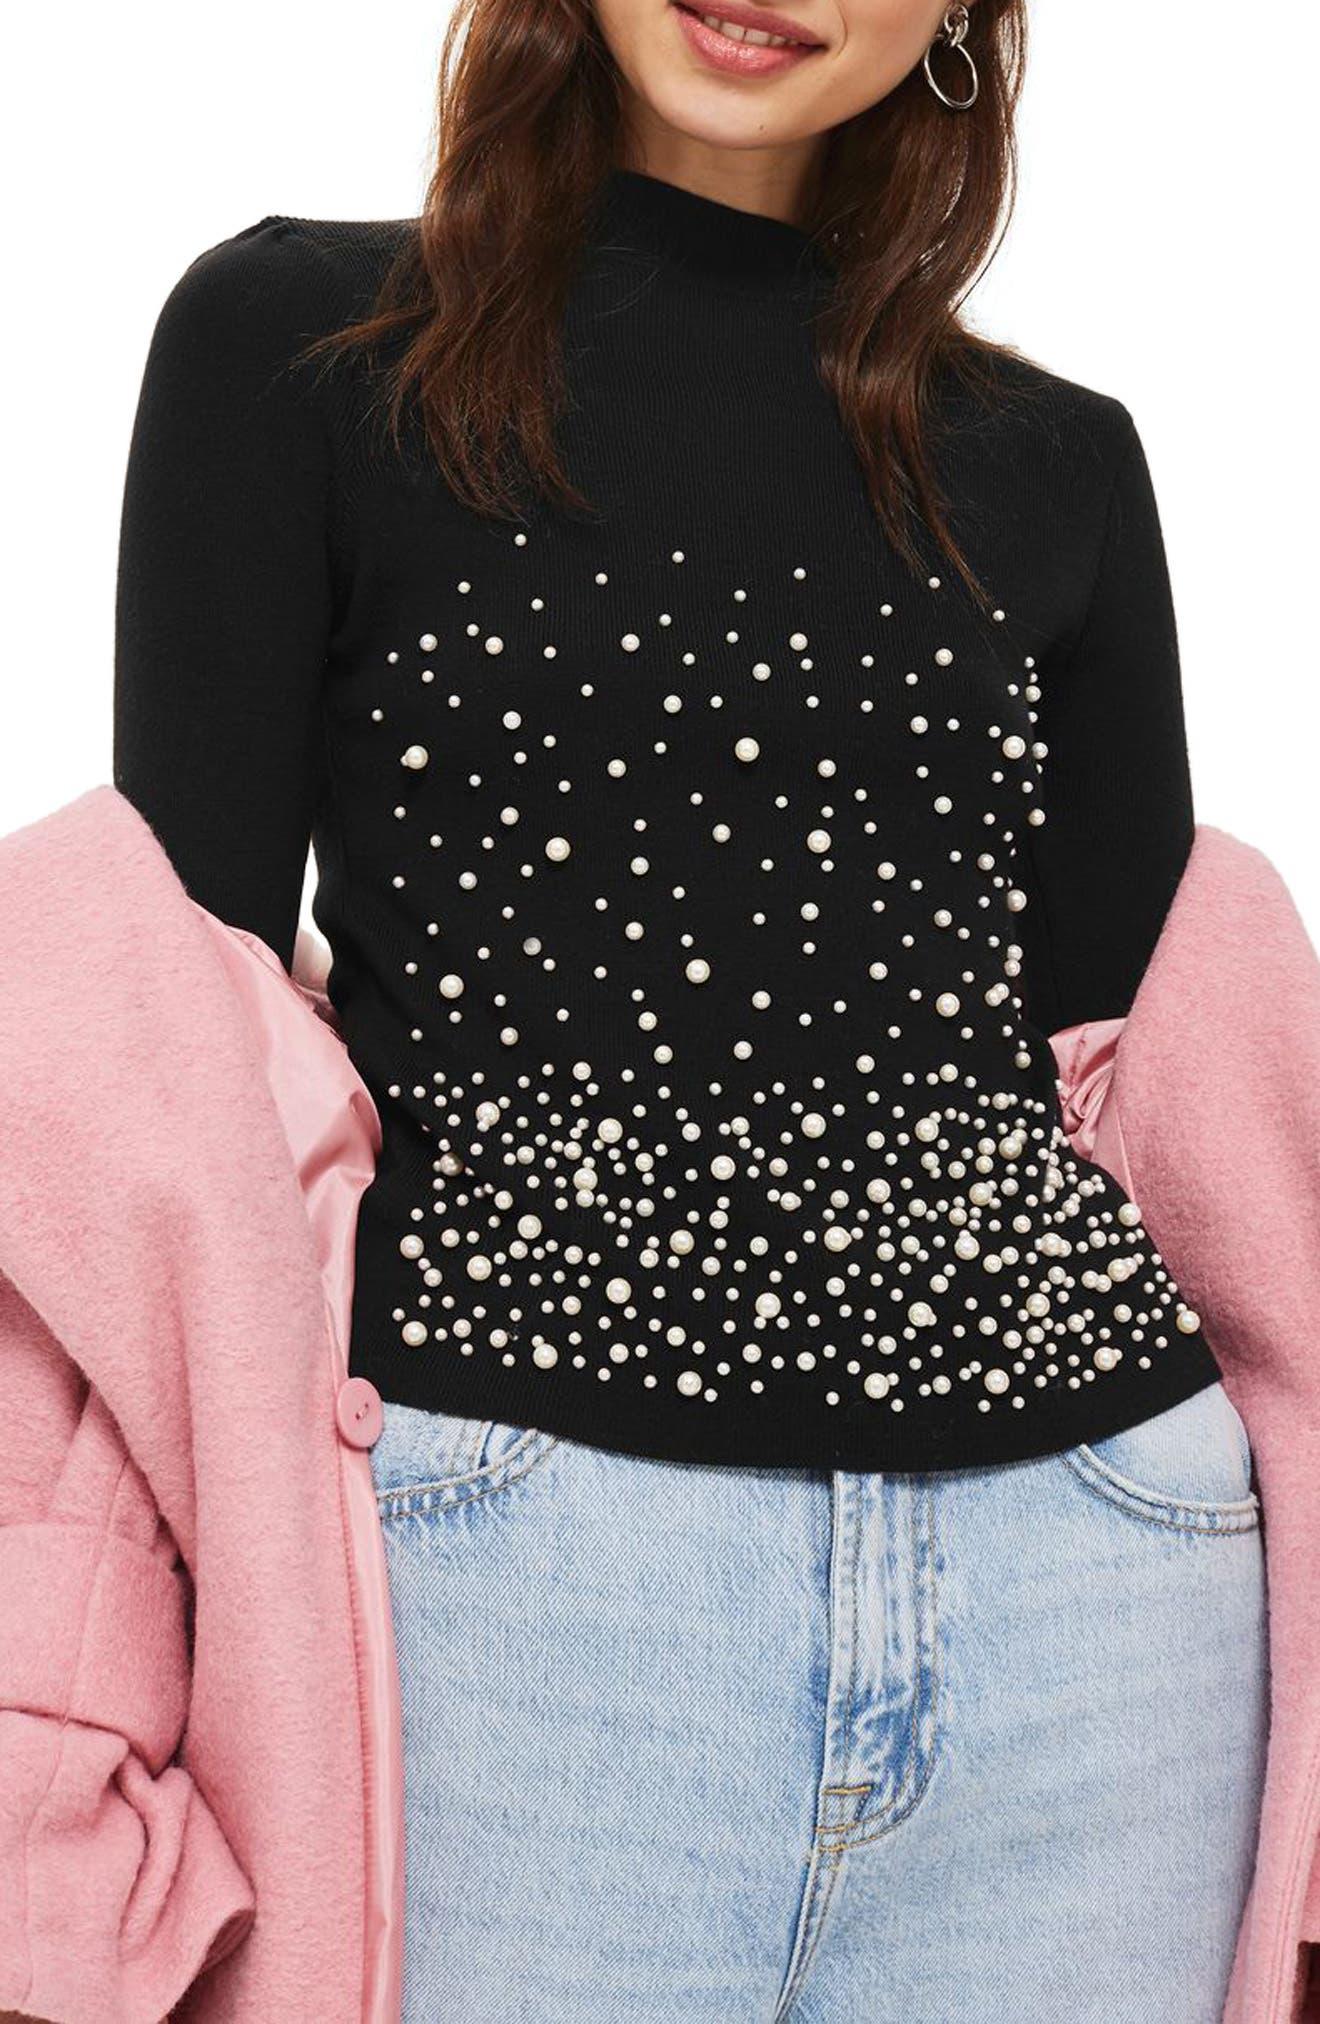 Graduated Imitation Pearl Sweater,                             Main thumbnail 1, color,                             Black Multi